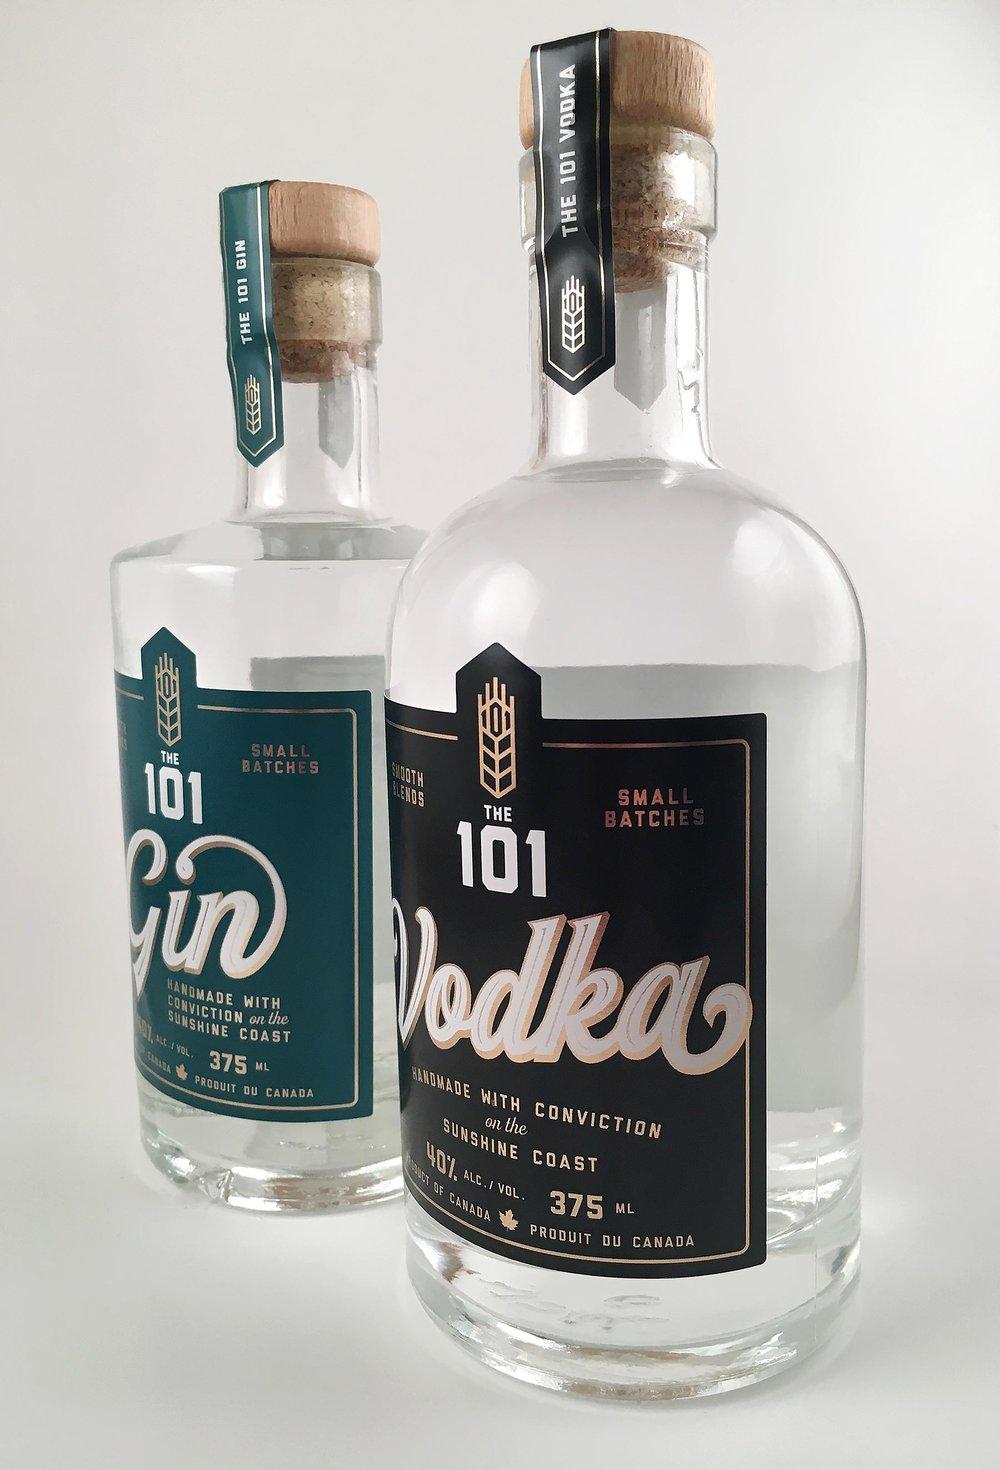 The101_vodka_gin_labels.jpg